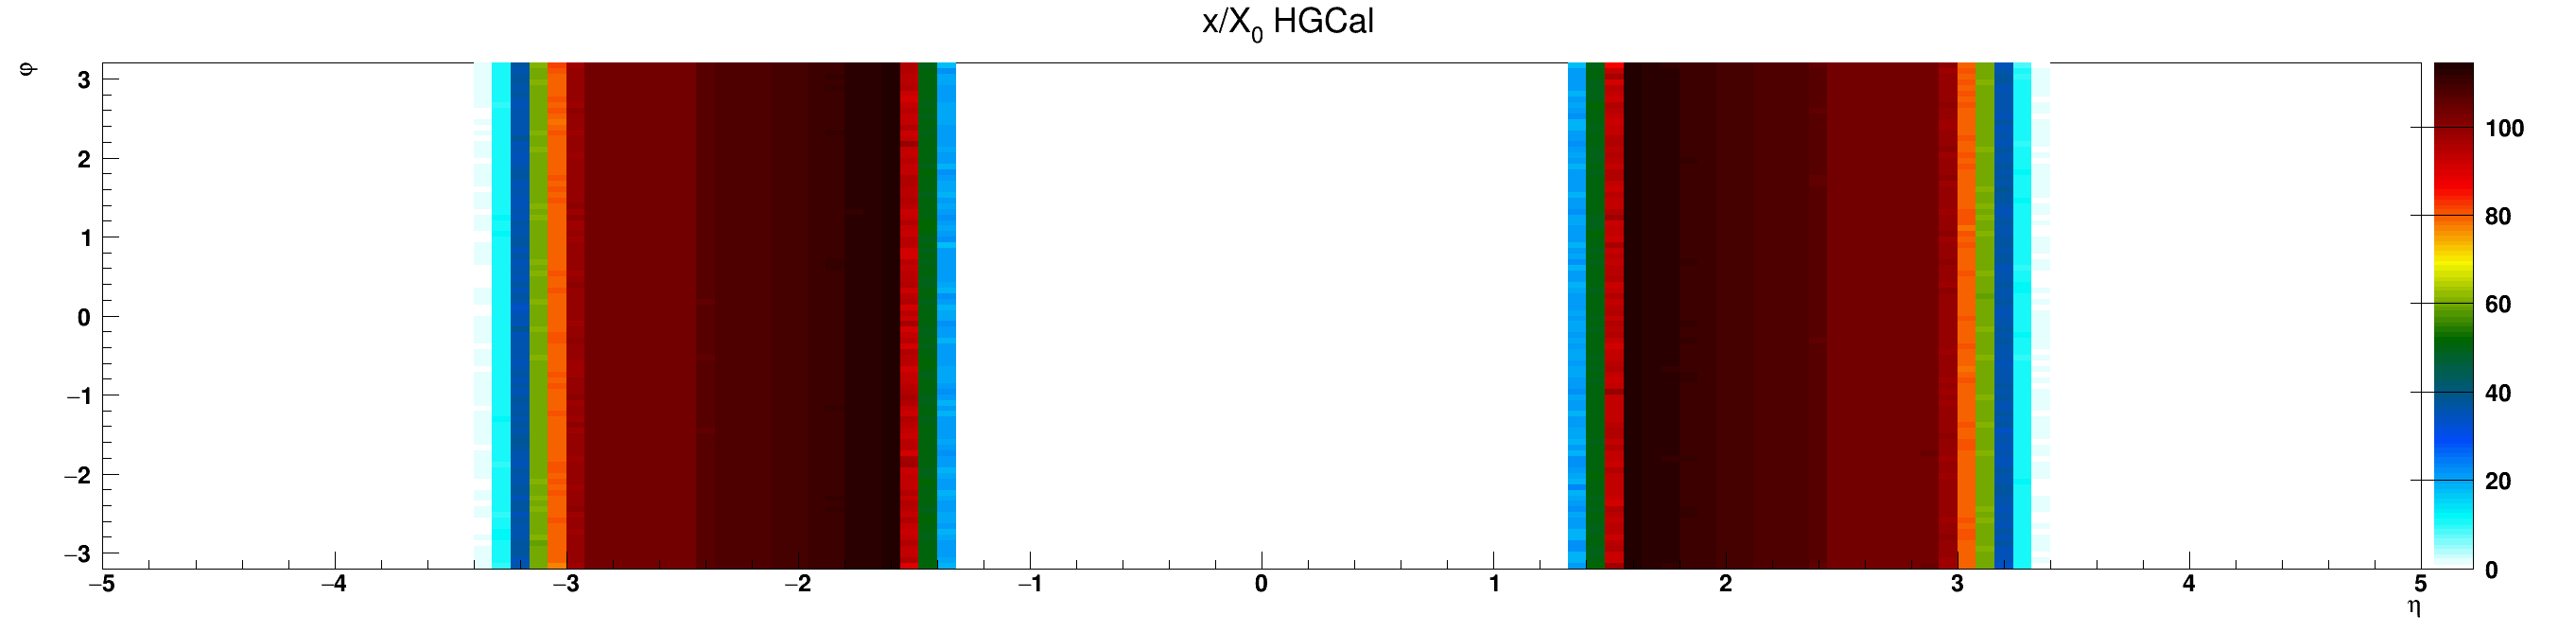 HGCal_x_vs_eta_vs_phi.png